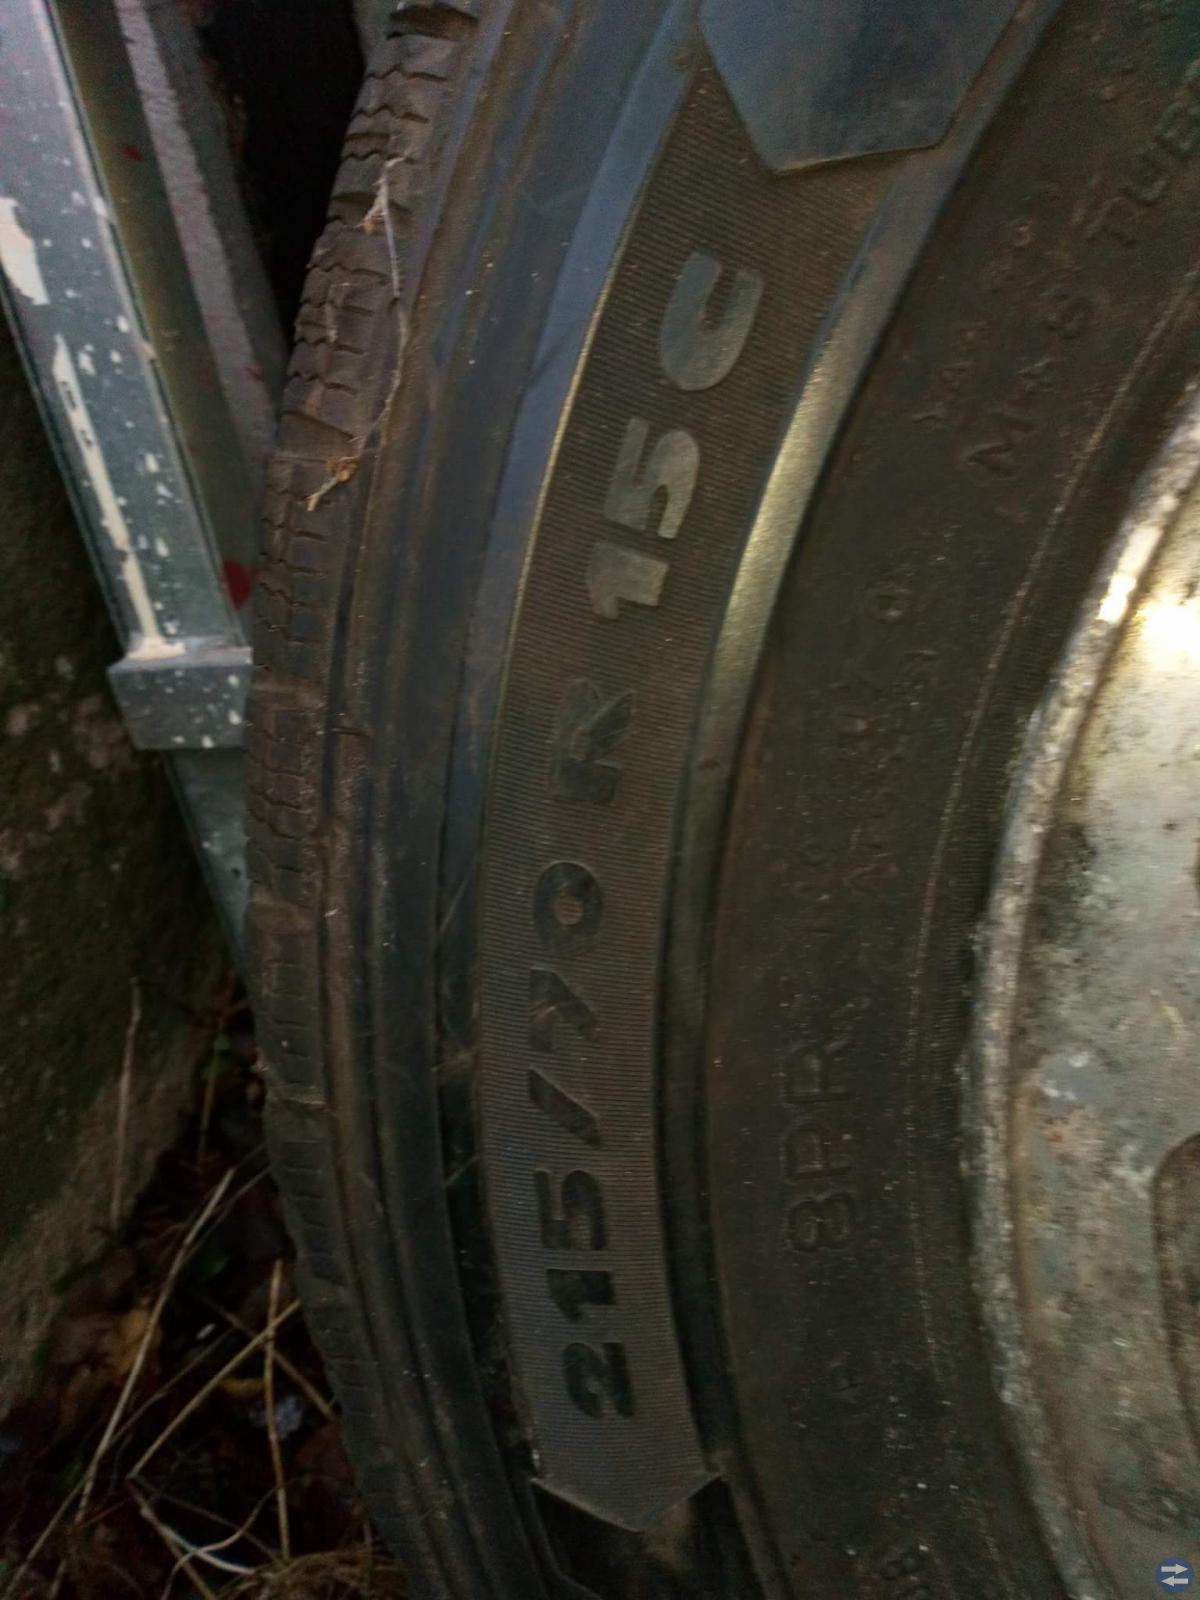 C-däck. 215x70Rx15-C.däck Micheline på Ford fälgar